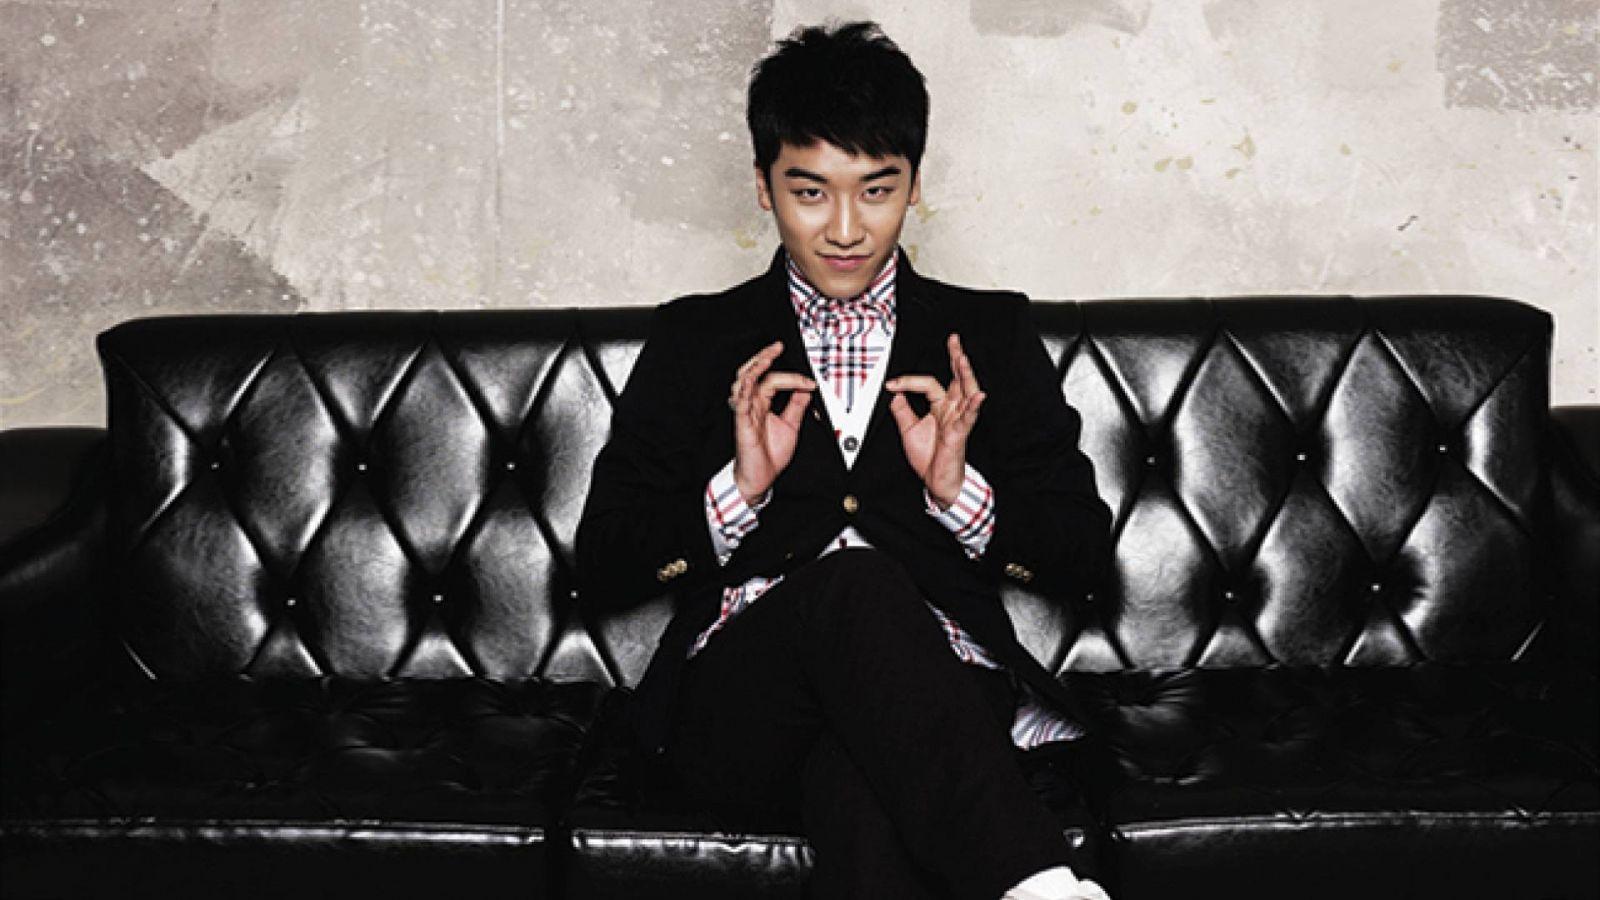 Seungri valmistelee soolomateriaalia? © YG Entertainment